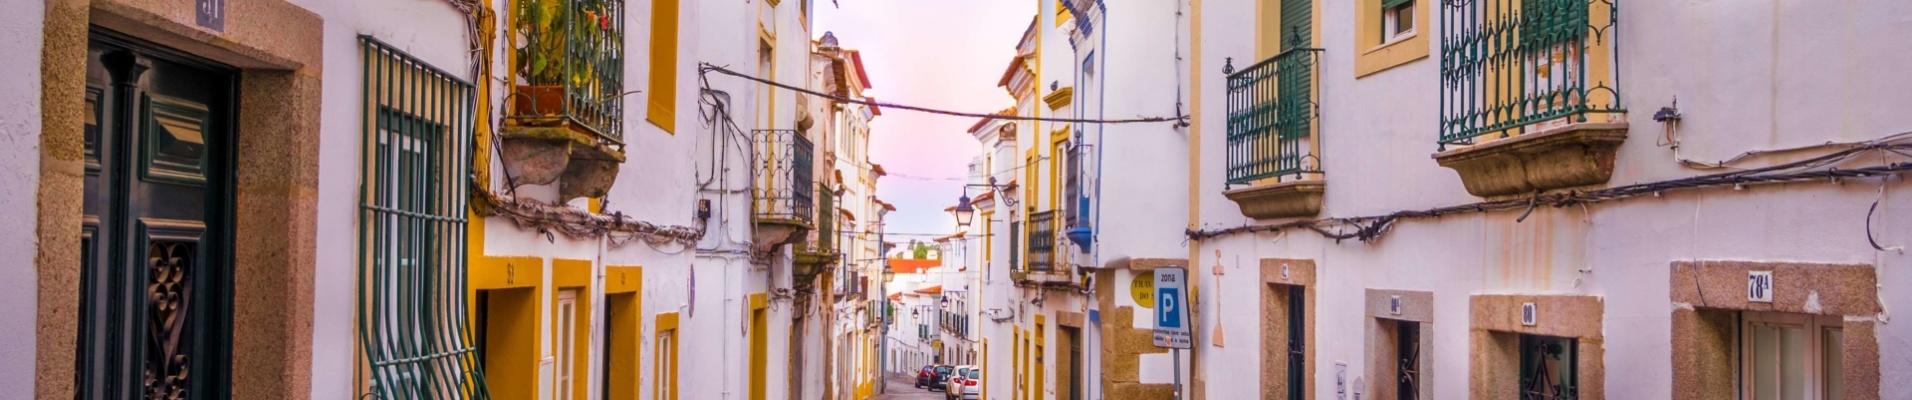 Rues Evora Portugal